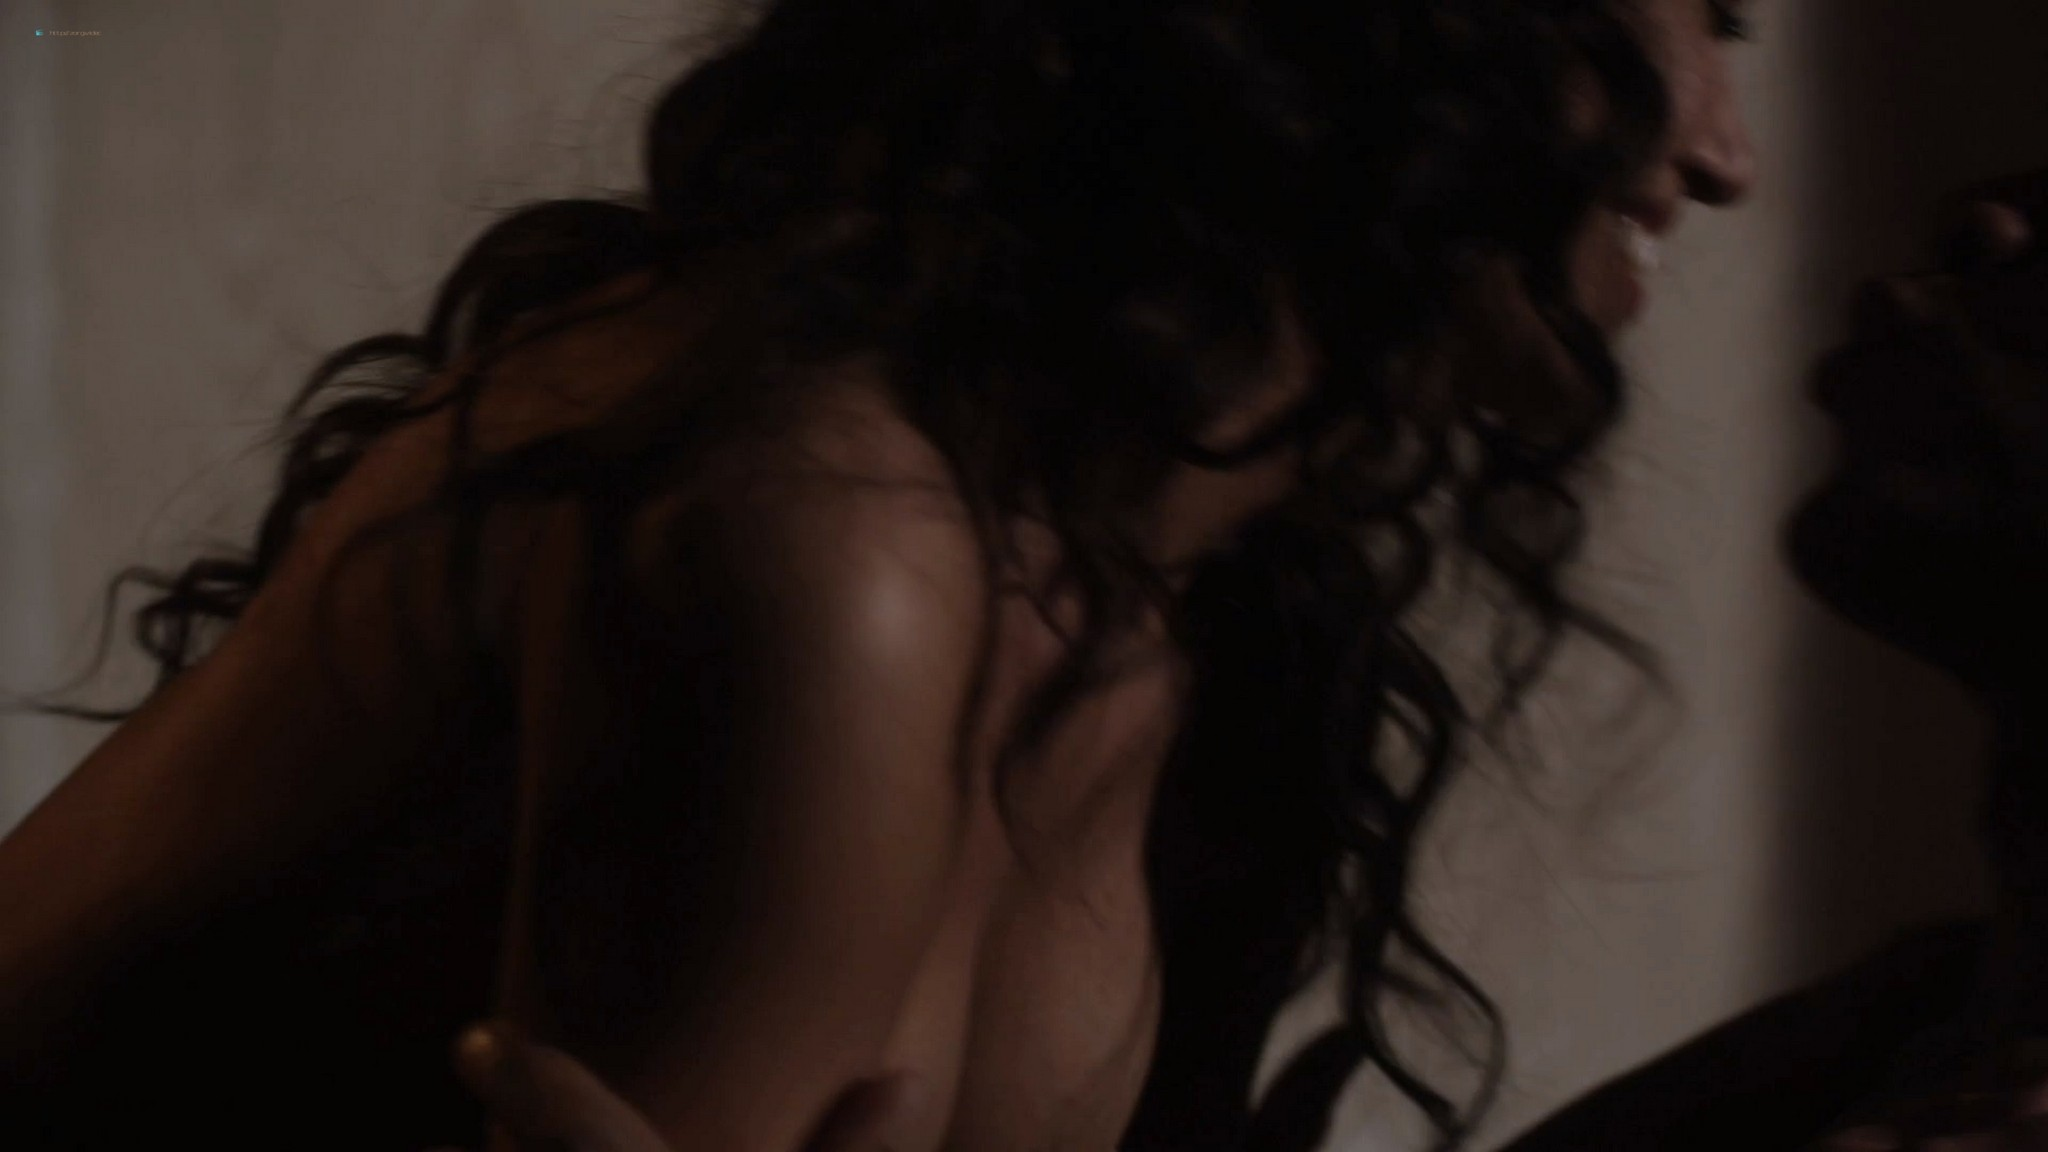 Paloma Guzman hot sex Tatum ONeal nipple slip and some sex Troubled Waters 2020 HD 1080p Web 004